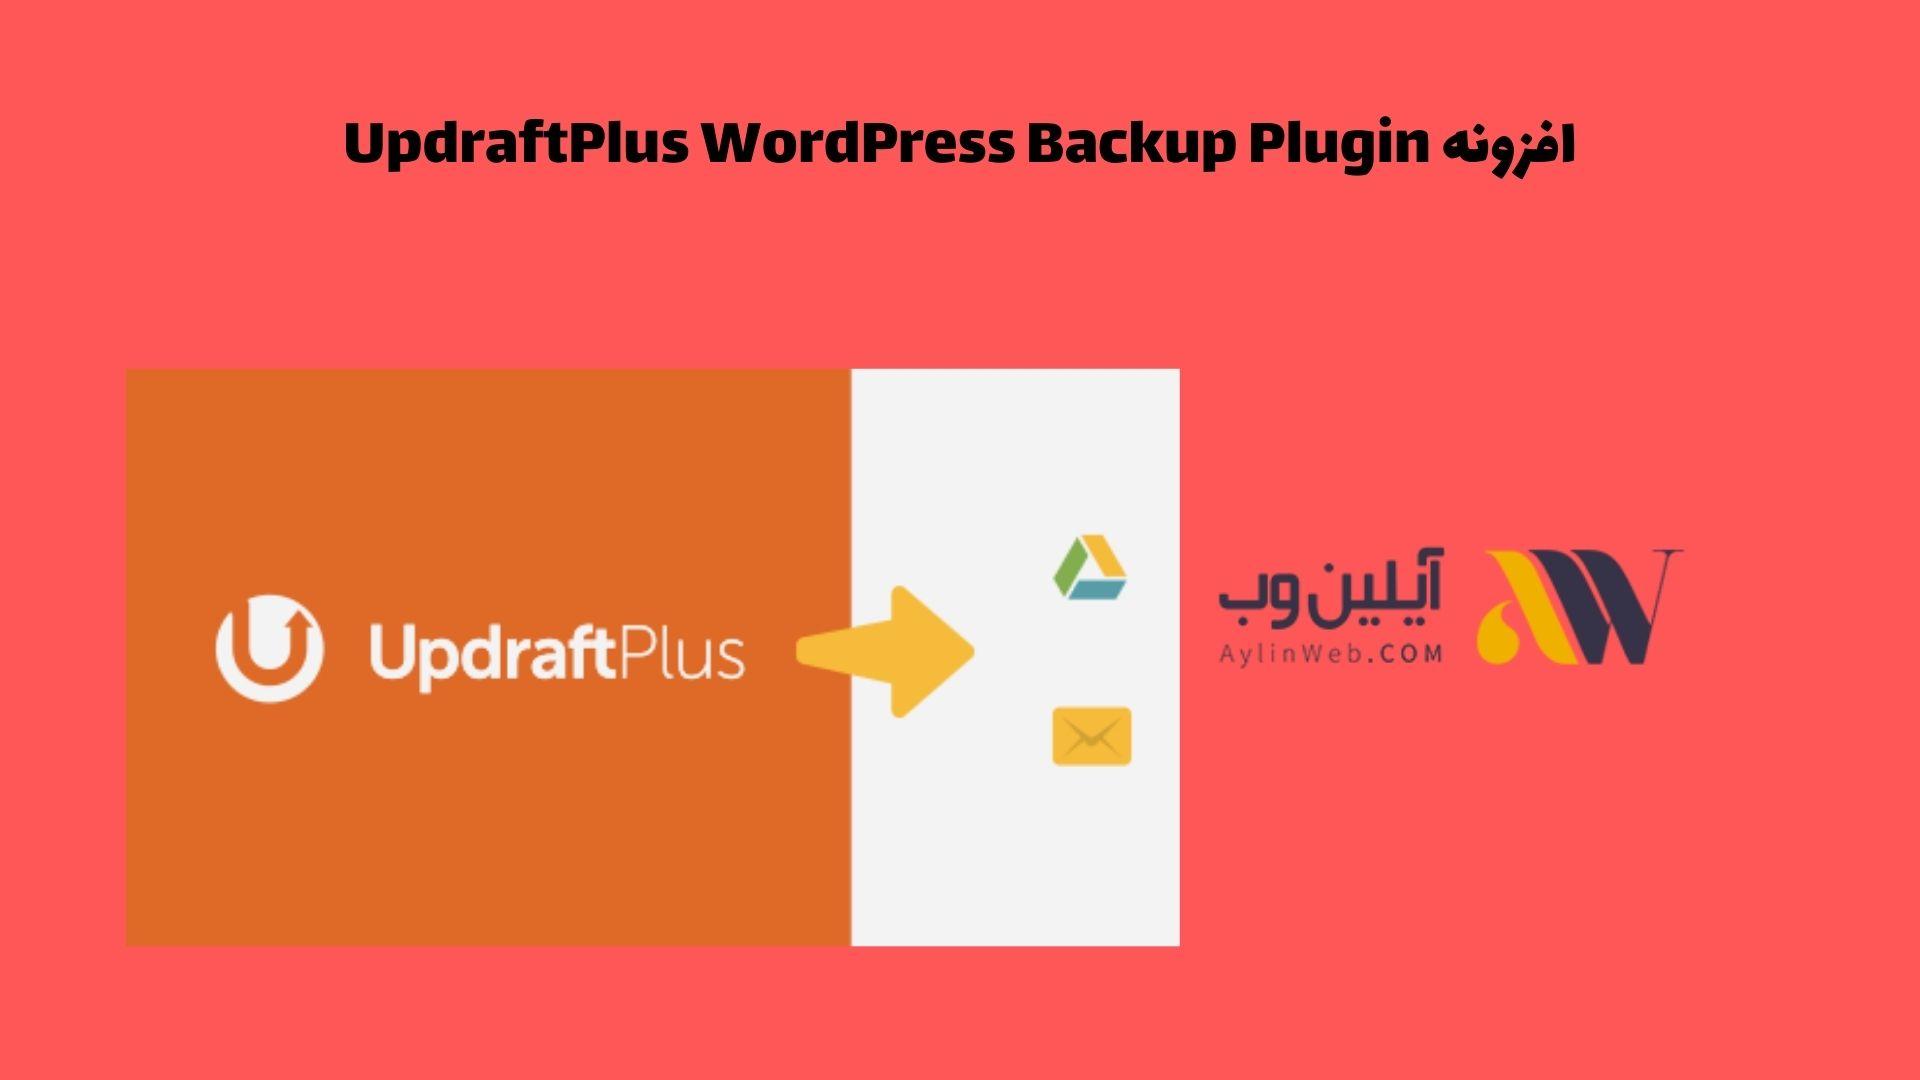 افزونه UpdraftPlus WordPress Backup Plugin